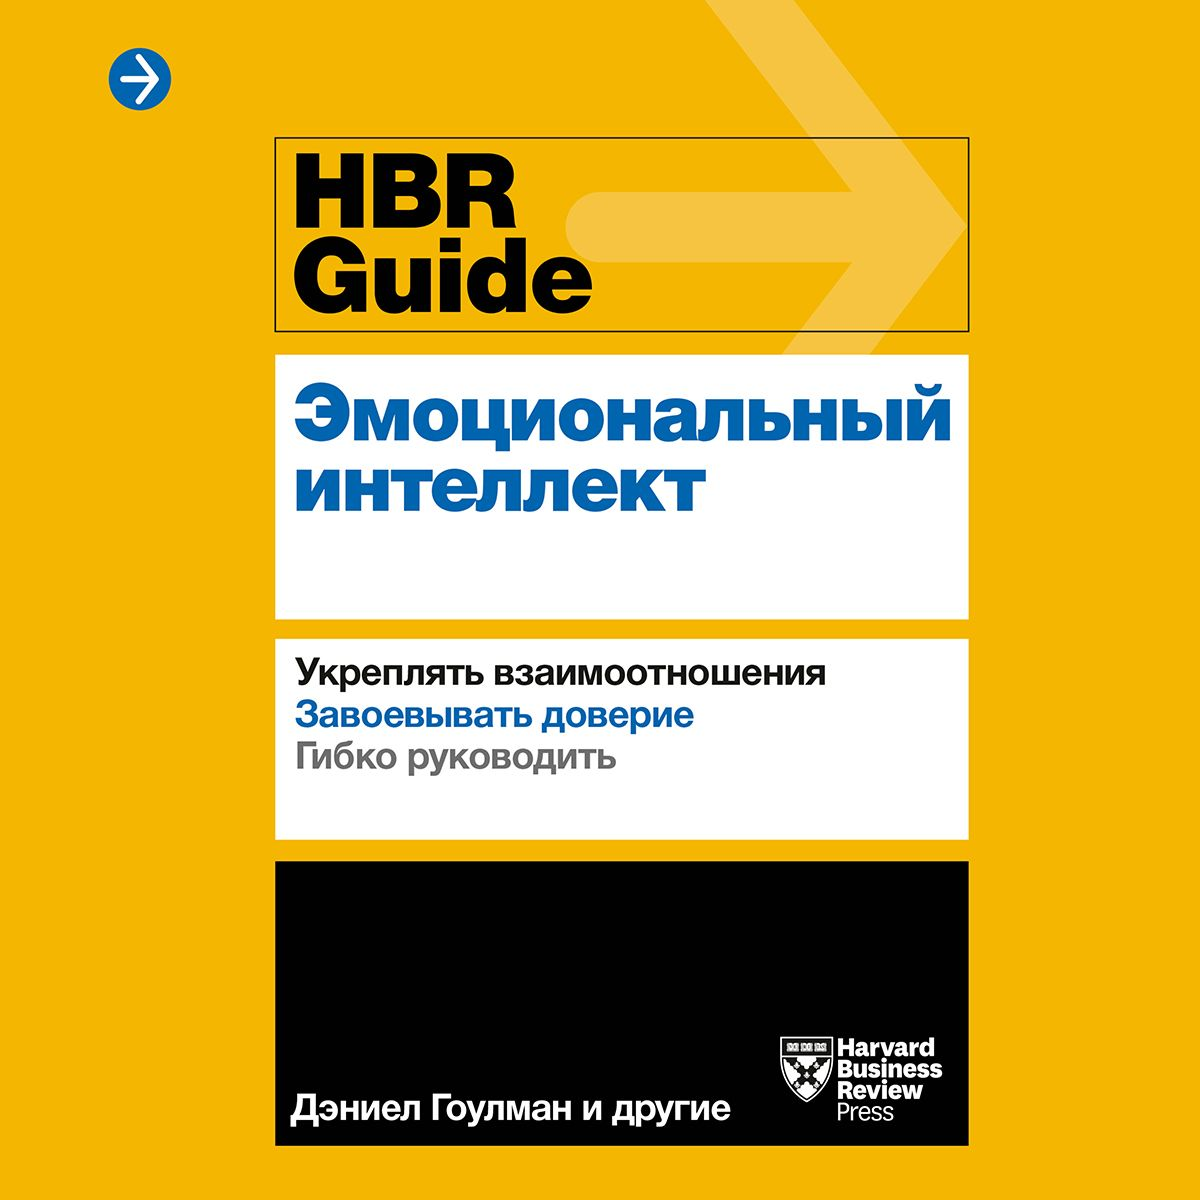 Harvard Business Review Guides HBR Guide. Эмоциональный интеллект